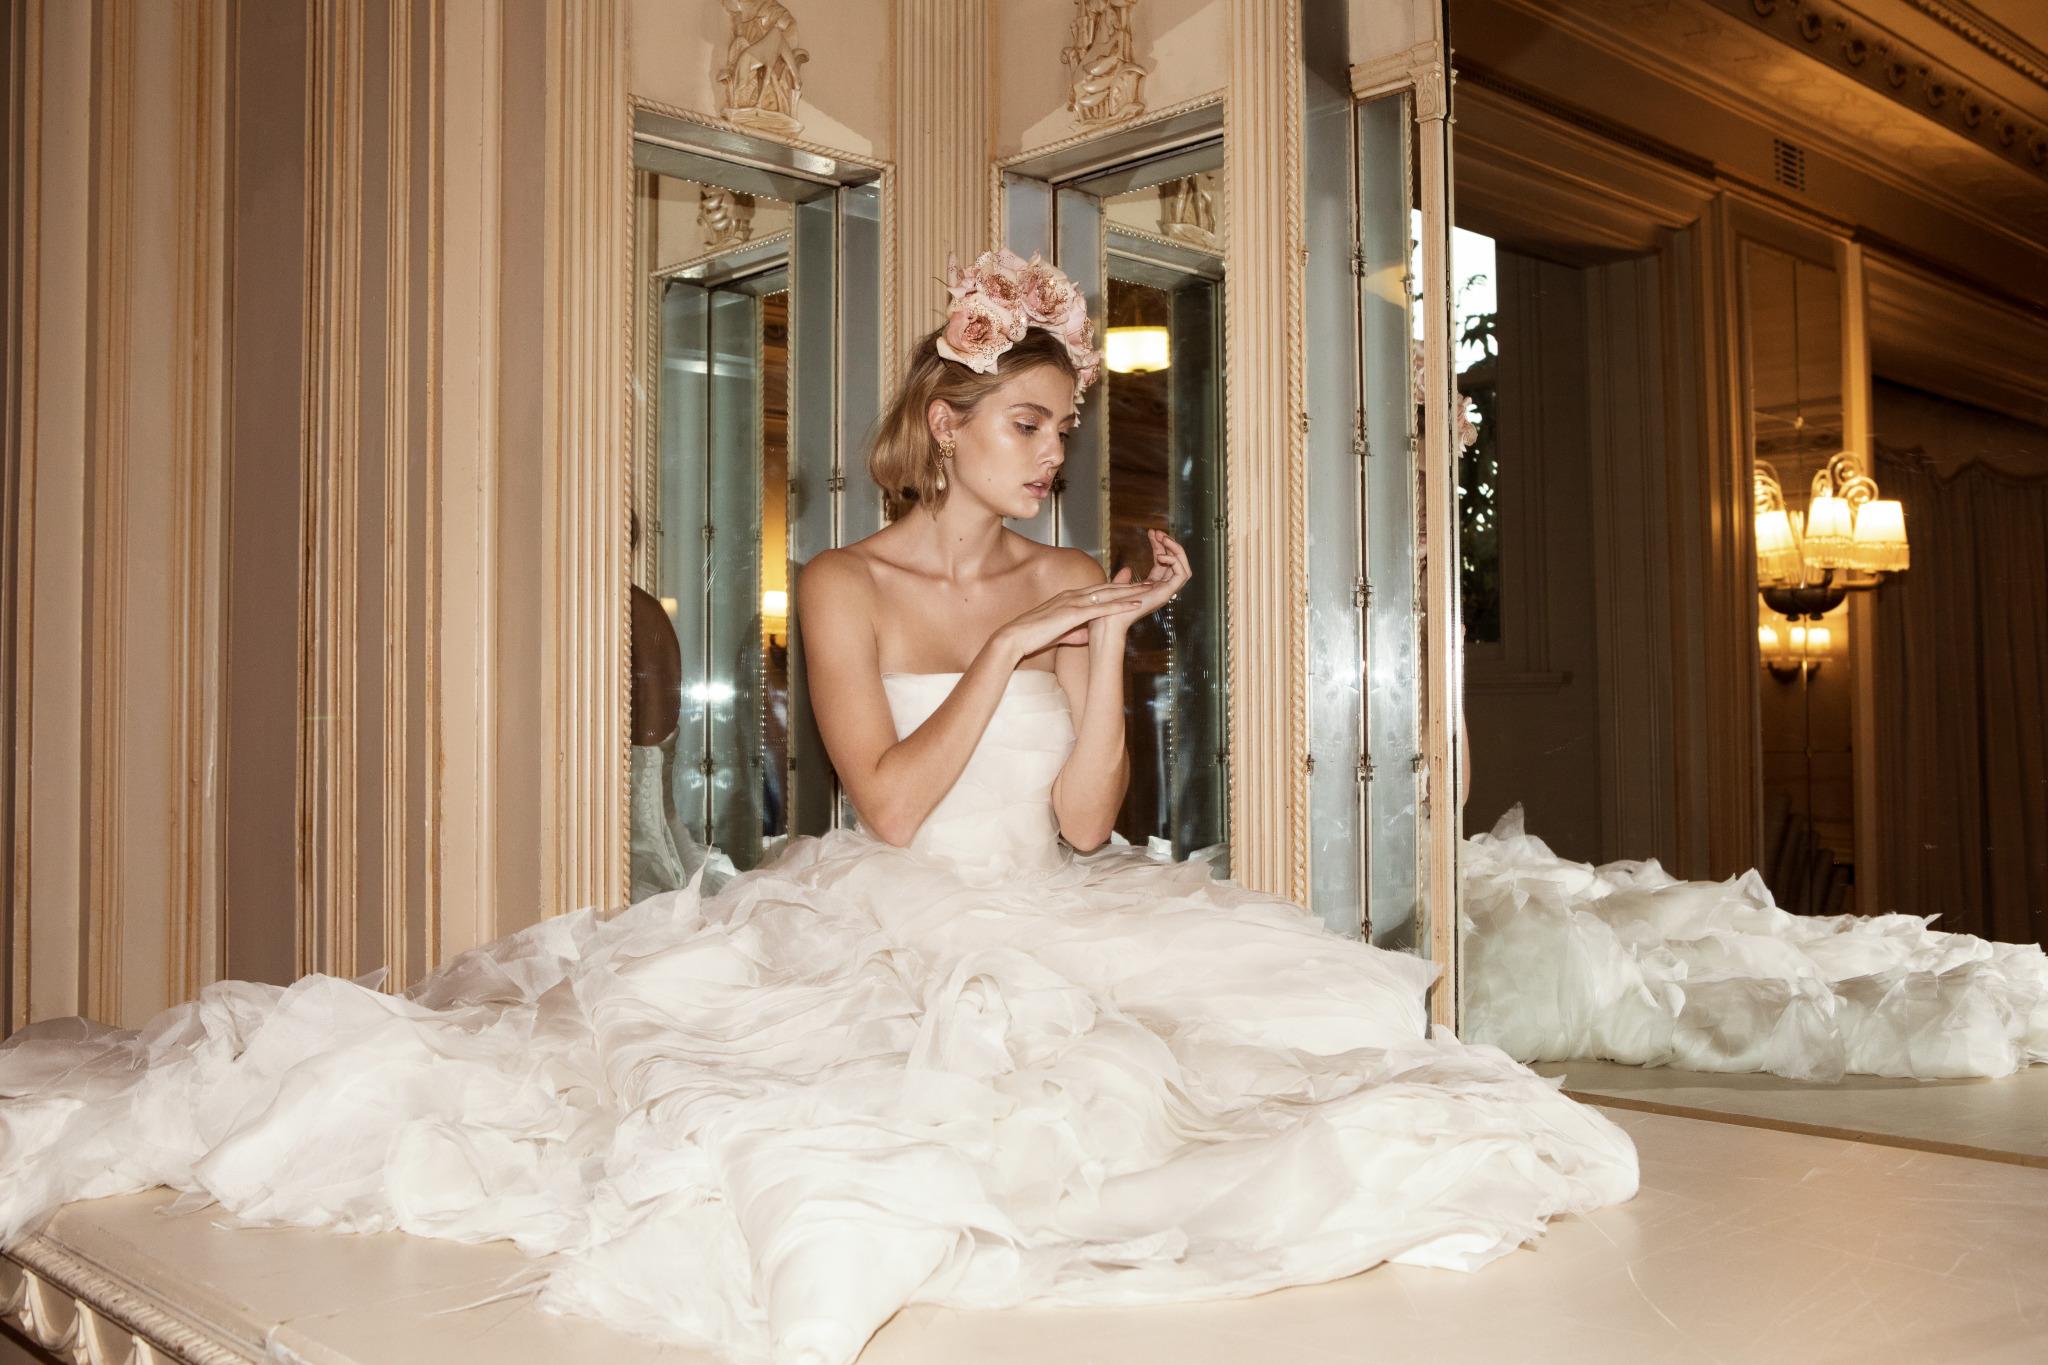 onedaybridal-1985-wedding-dress-collection-valentyna-1_preview.jpeg